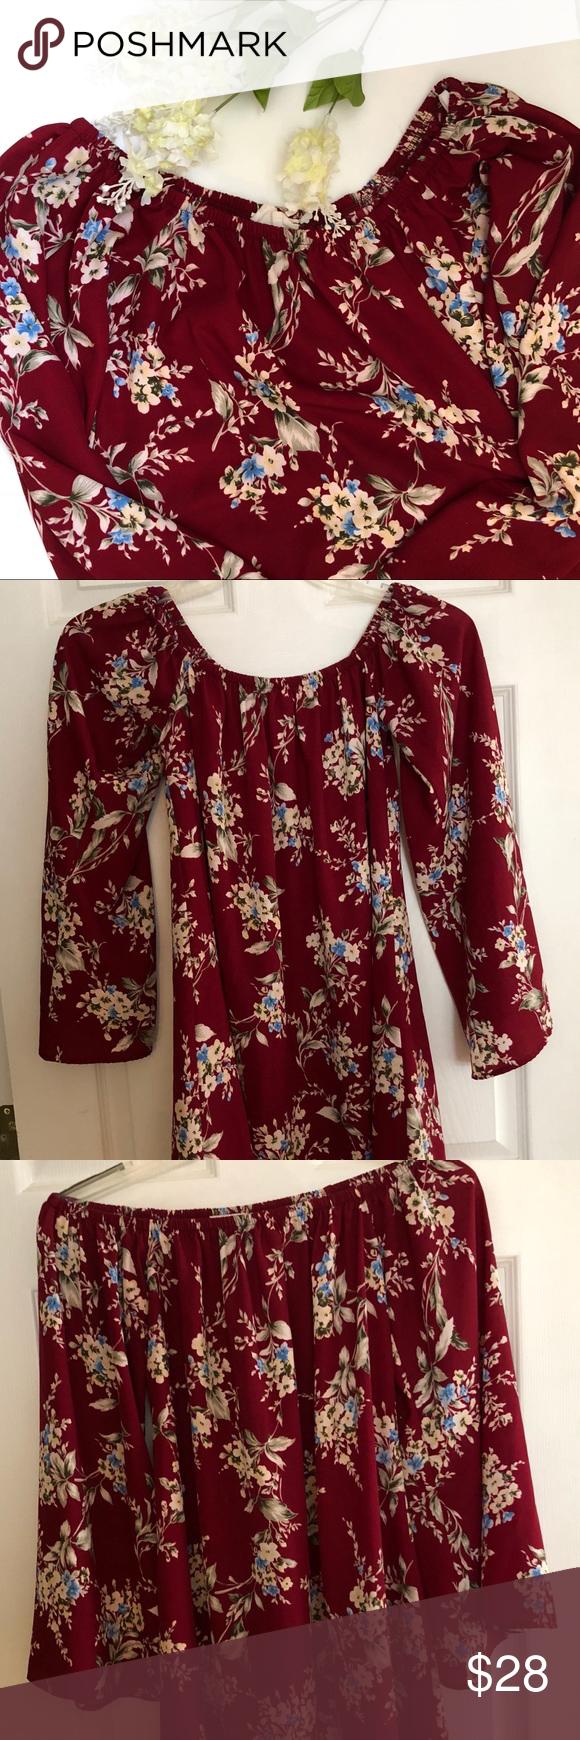 Promo Torch Tunik Women Burgundy Maroon M Terbaru 2018 Puritans Pride Vitamin B 12 2500 Mcg Sublingual 100 Microlozenges B12 Kesemutan Kebas Syaraf Vegetarian Sleeveless Dress Shirt Off Shoulder Floral Tunic